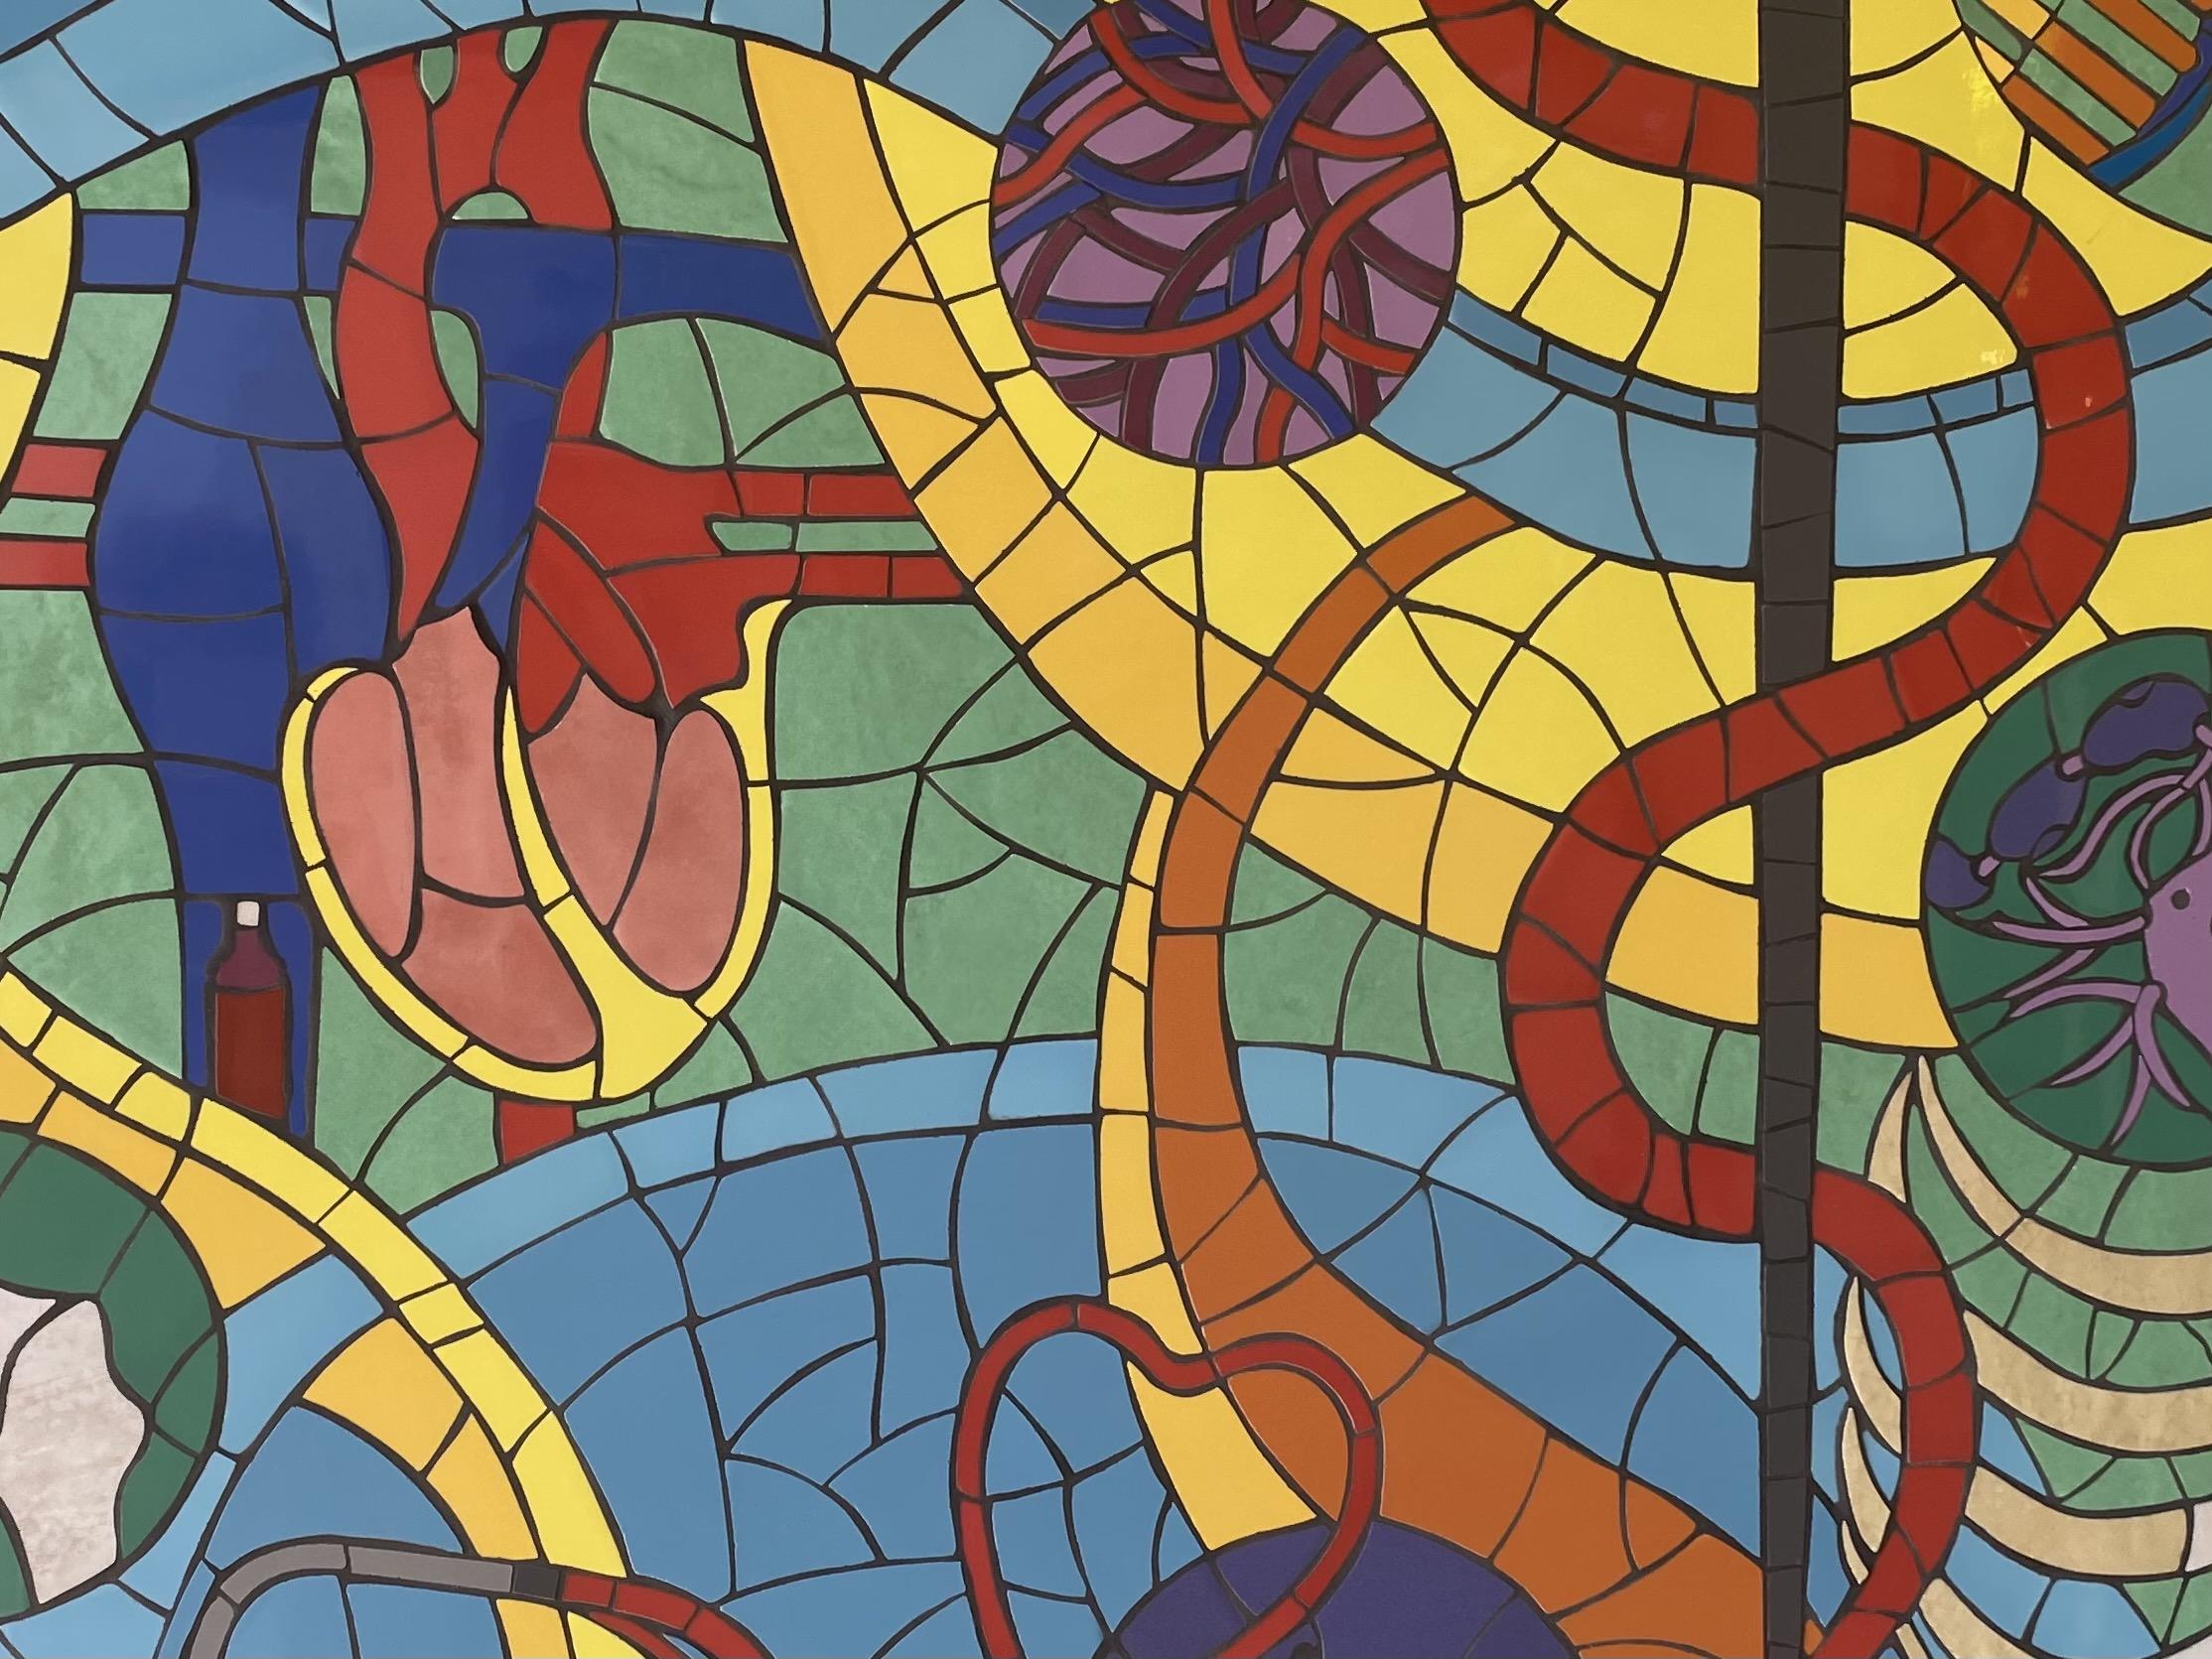 Symbols of Practice mosaic